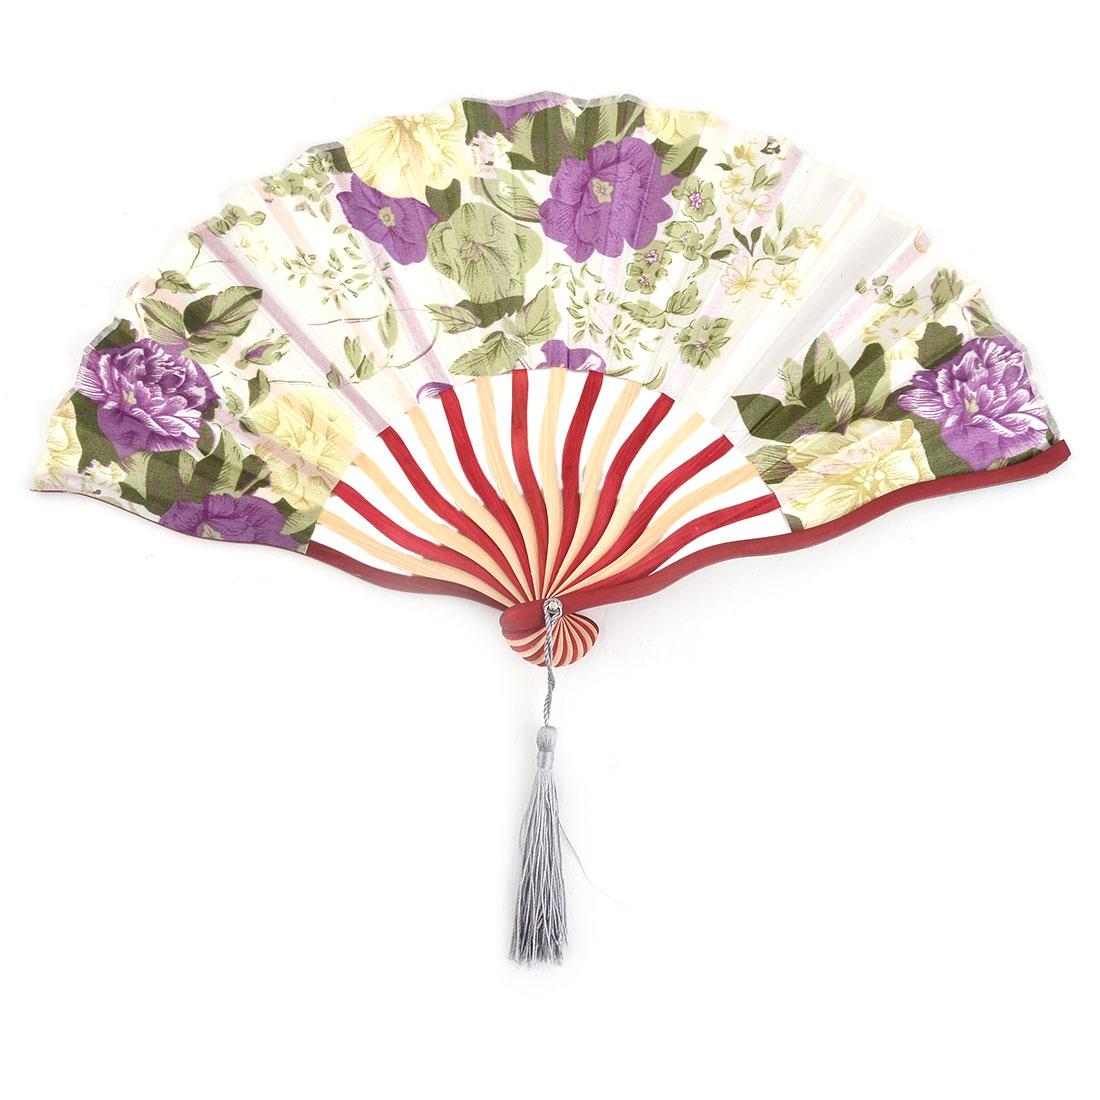 Polyester Flower Printed Tassel Handmade Summer Folding Hand Fan 8.3 Inches Length